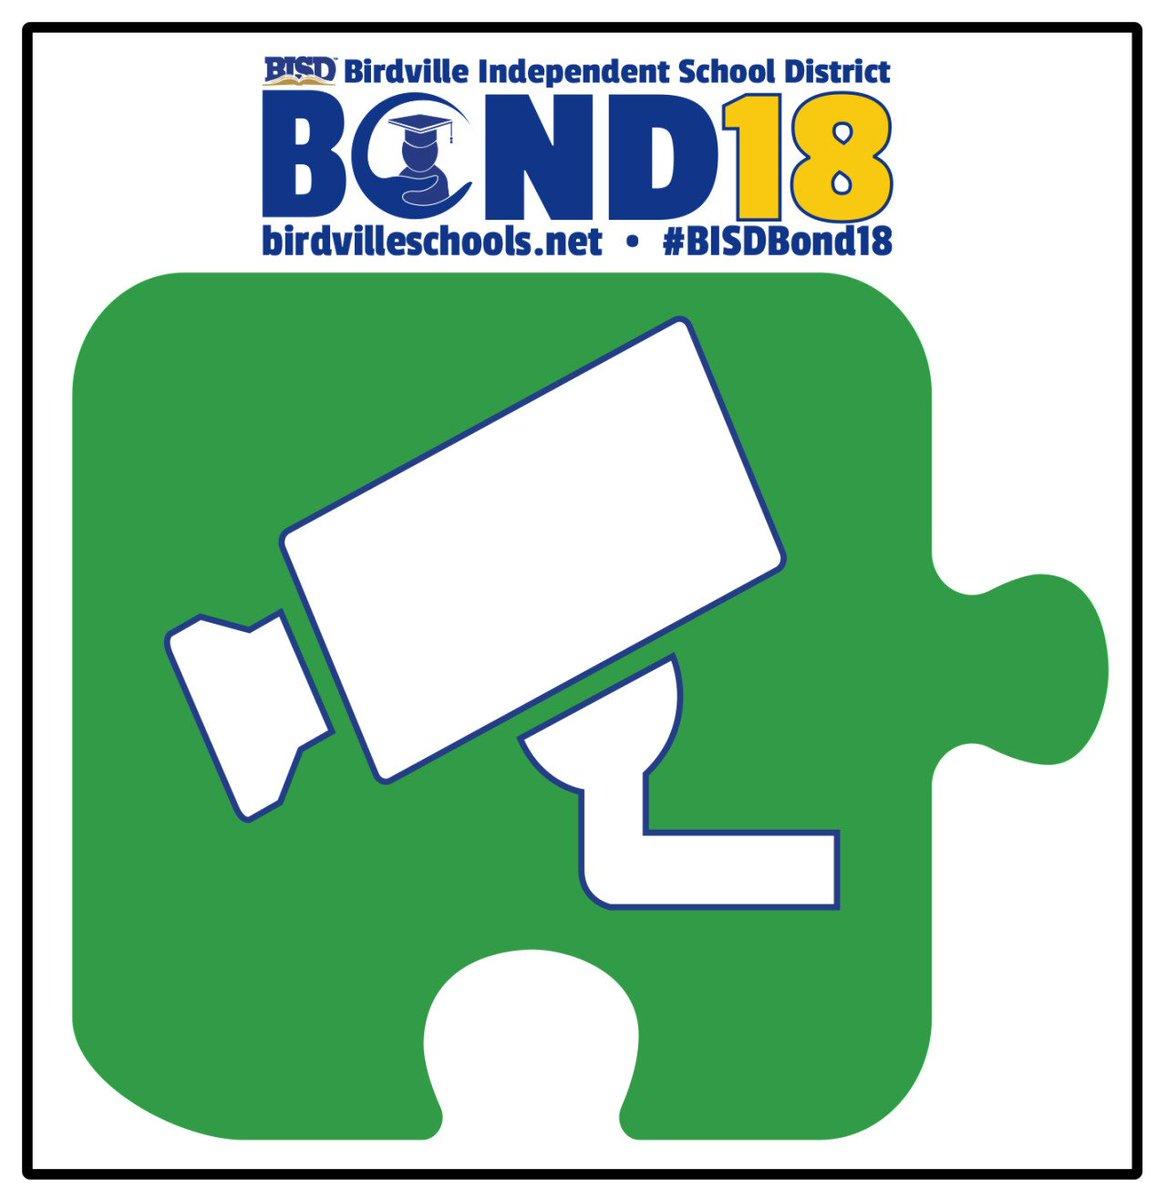 Birdville Isd On Twitter Did You Know Bisd S Bond Program Funds Safety Vestibules On 15 Of Our Oldest Campuses Bisdbond18 Https T Co Dvkbdwsfbd Https T Co Okwriccjuf